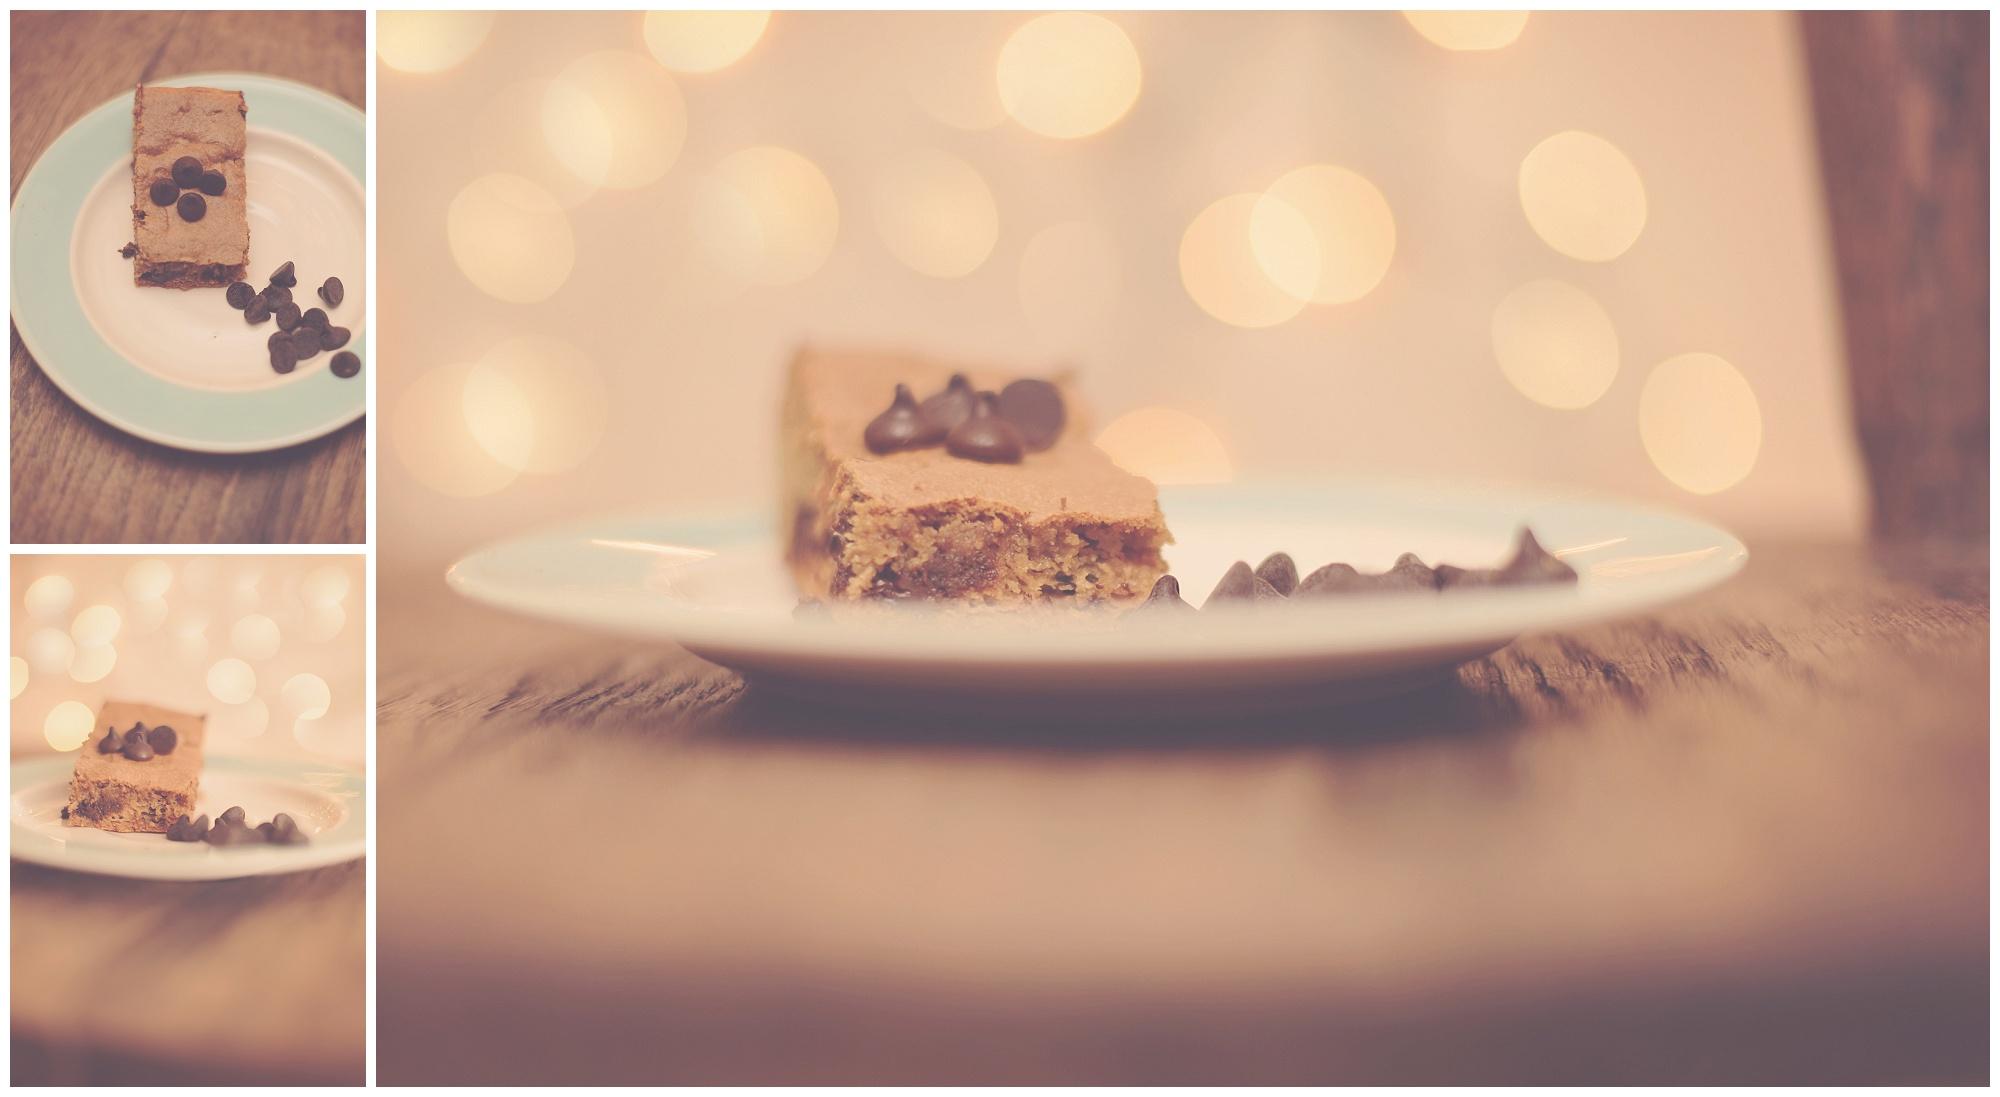 Caramel Chocolate Chip Bars by Sarah Halstead